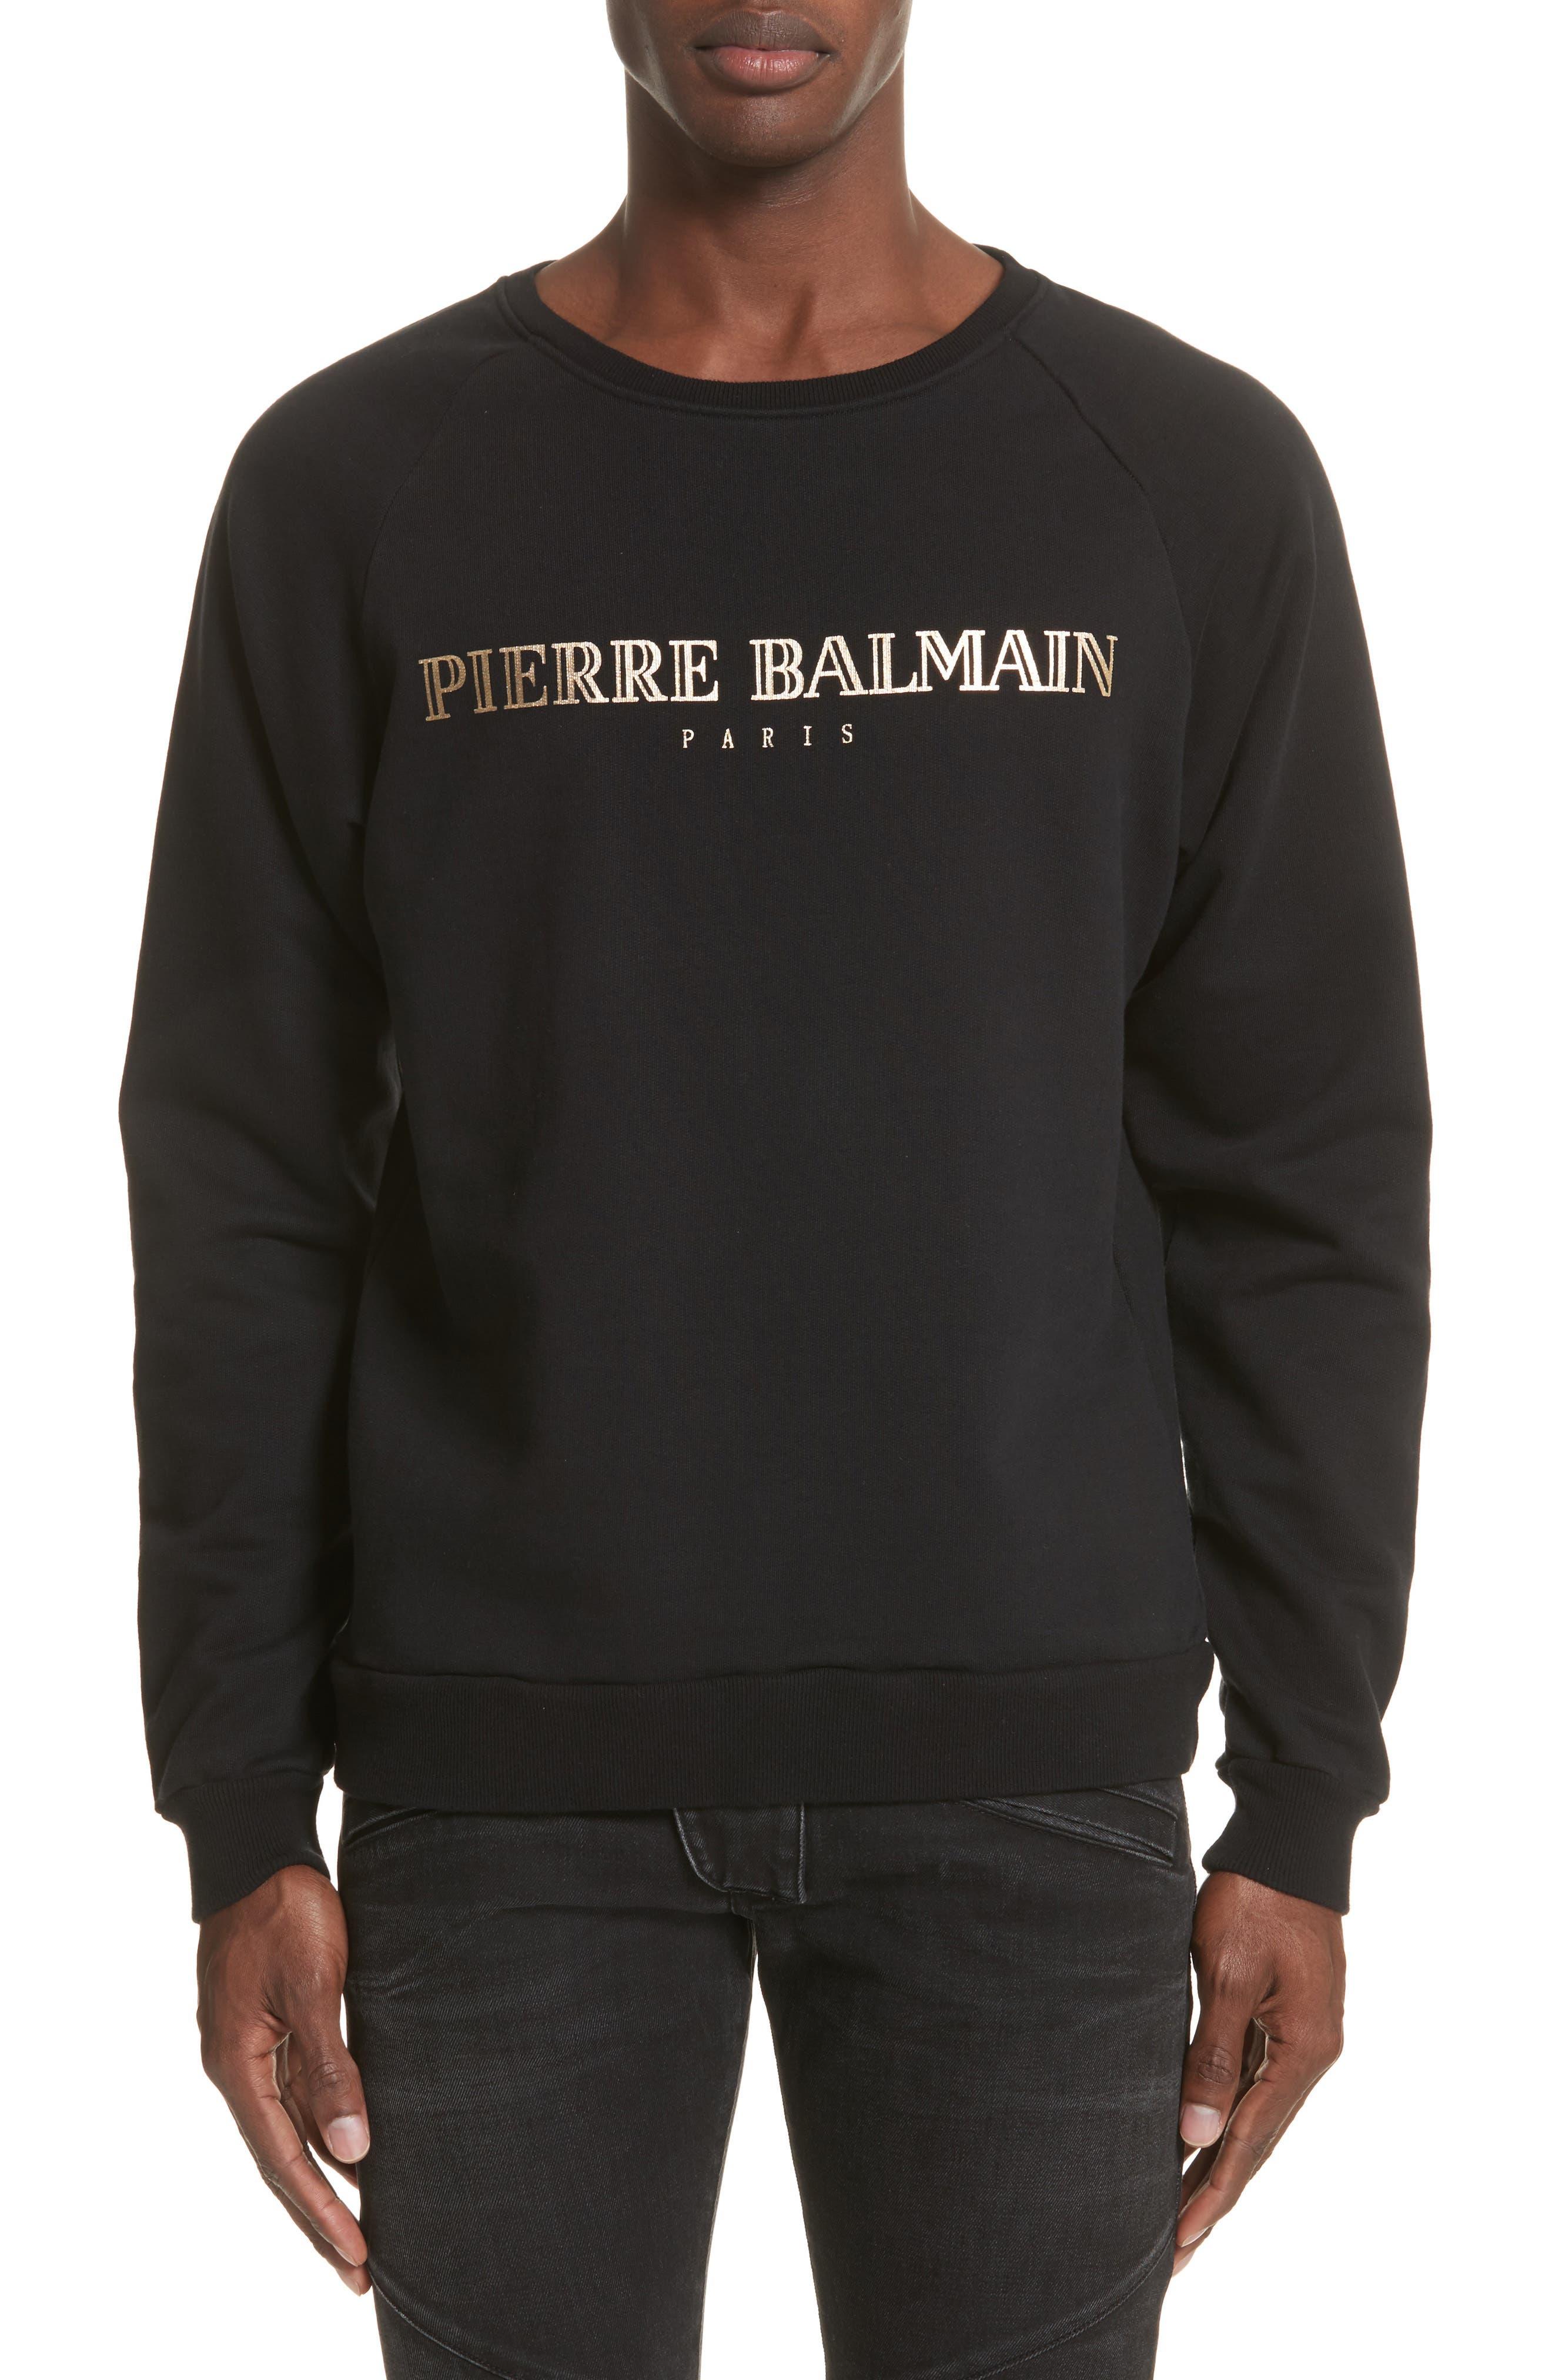 Pierre Balmain Logo Graphic Sweatshirt